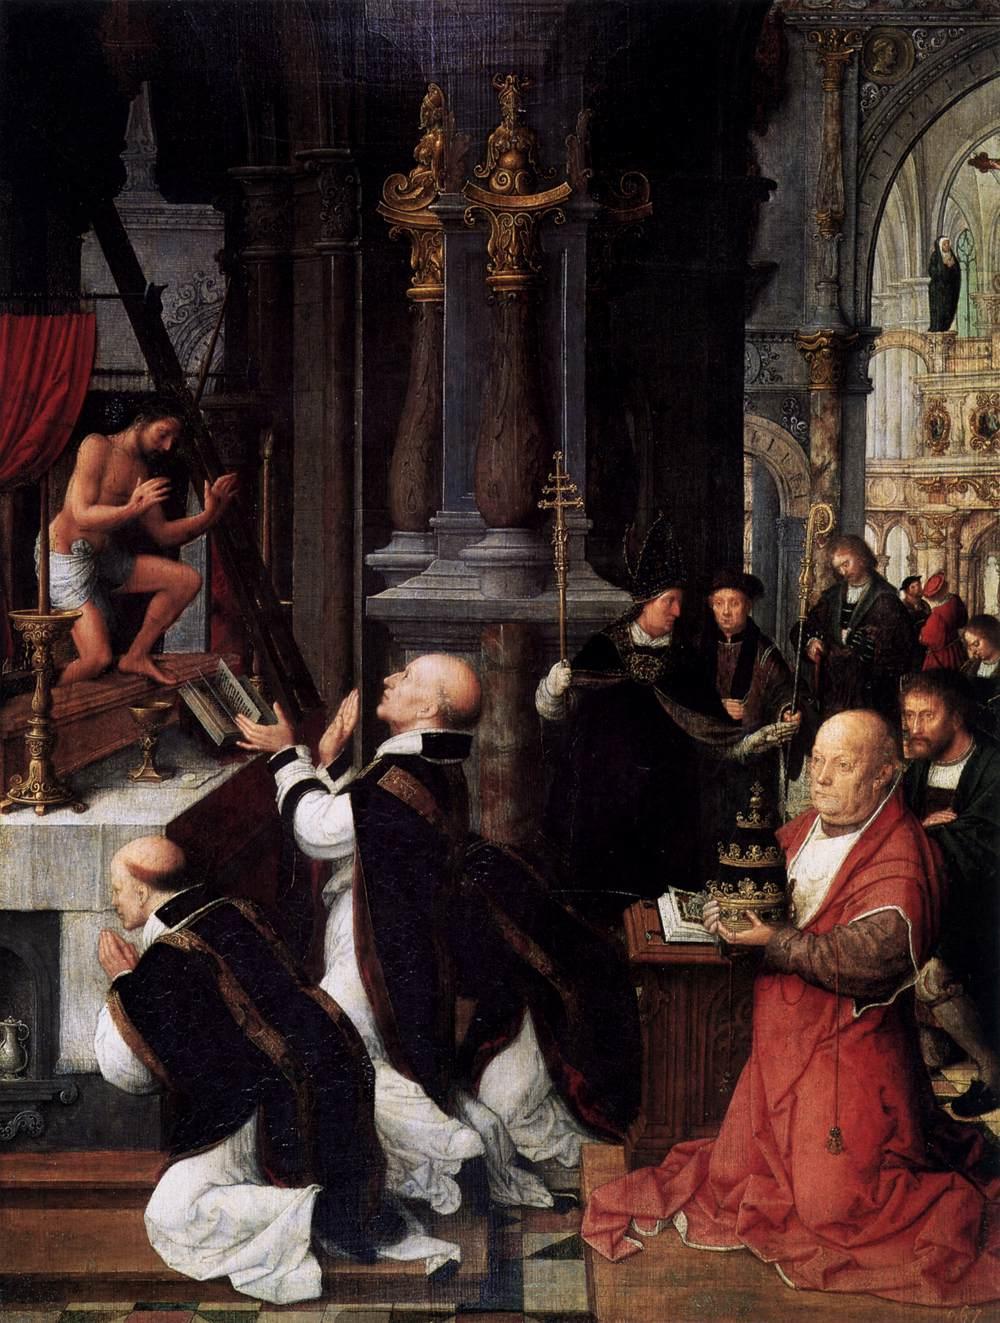 https://i2.wp.com/upload.wikimedia.org/wikipedia/commons/e/ec/Adriaen_Isenbrant_-_Mass_of_St_Gregory_-_WGA11872.jpg